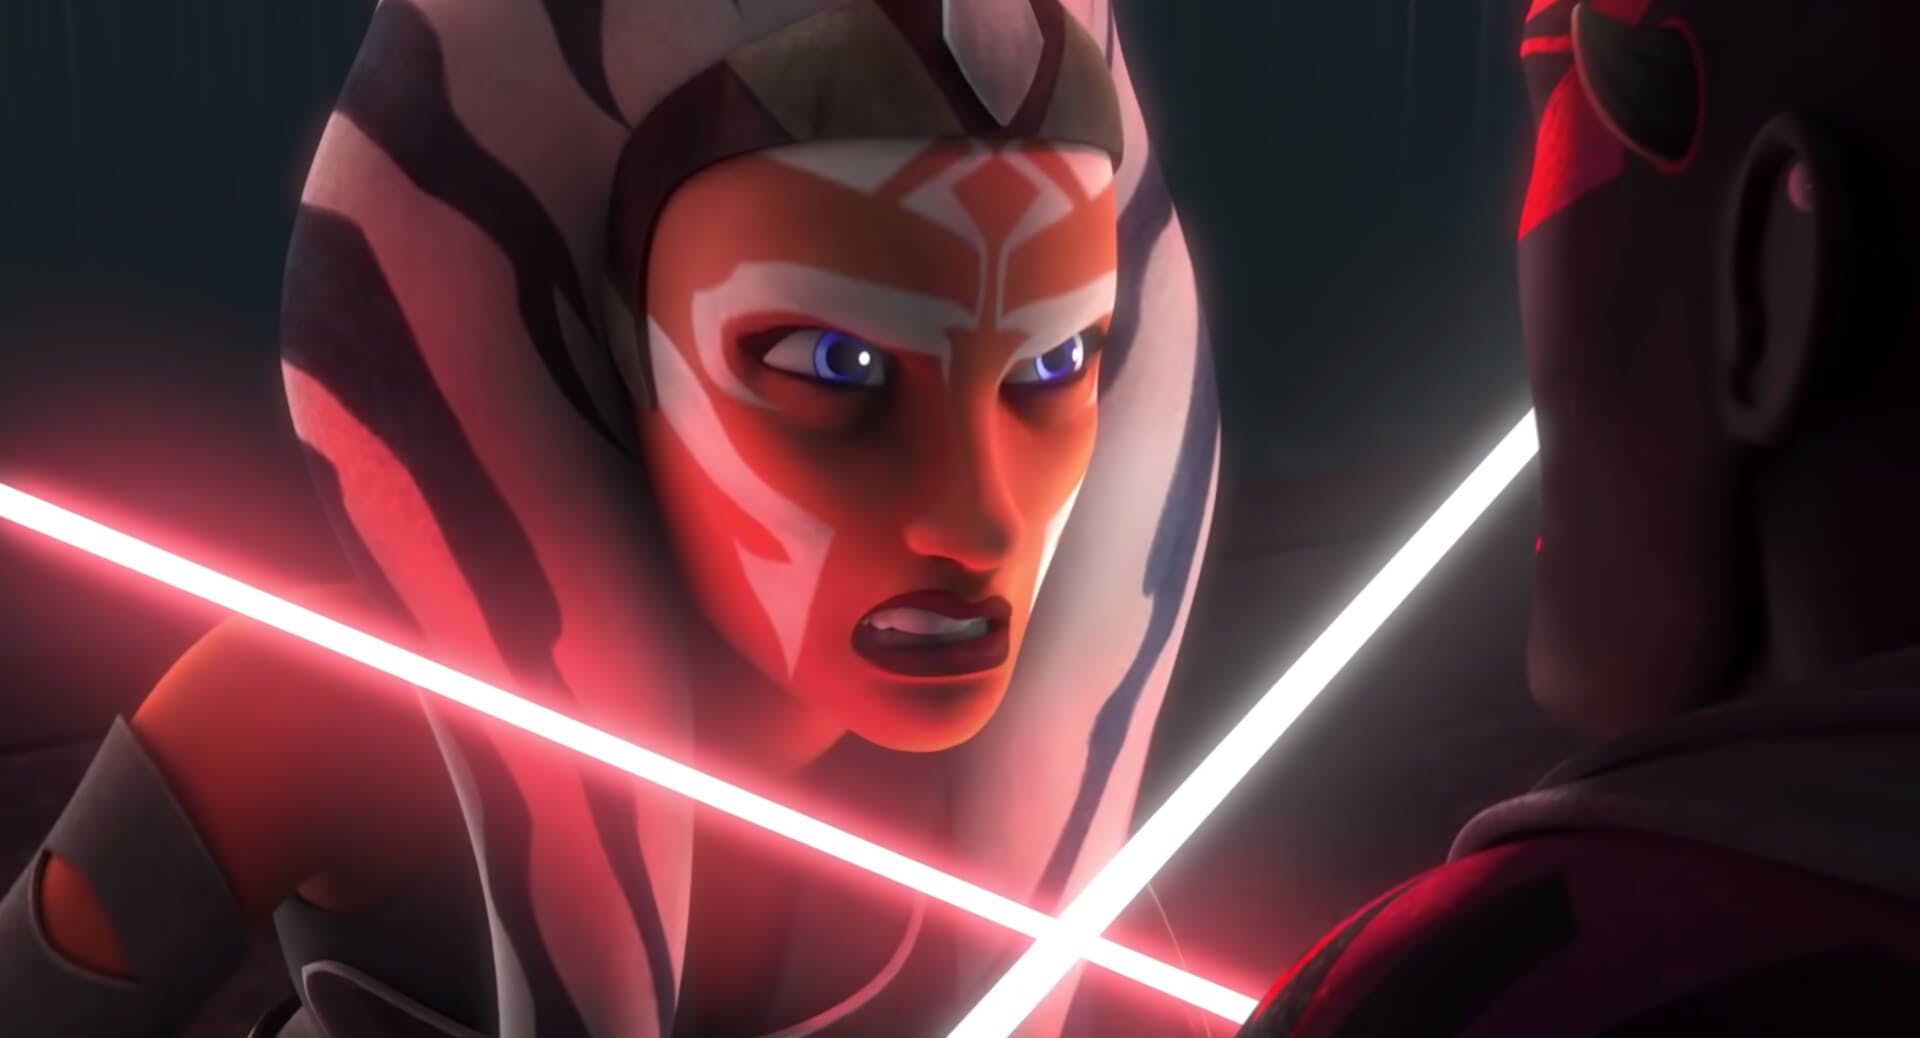 Image of Ahsoka with a lightsaber